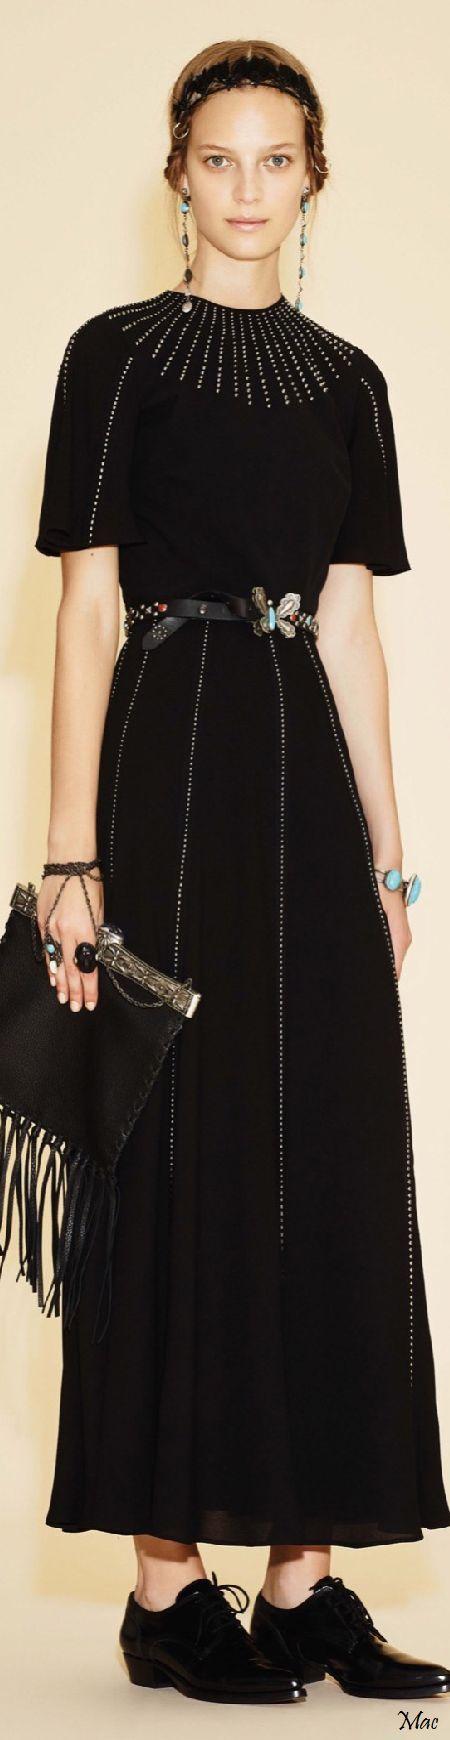 Resort 2016 Valentino black dress